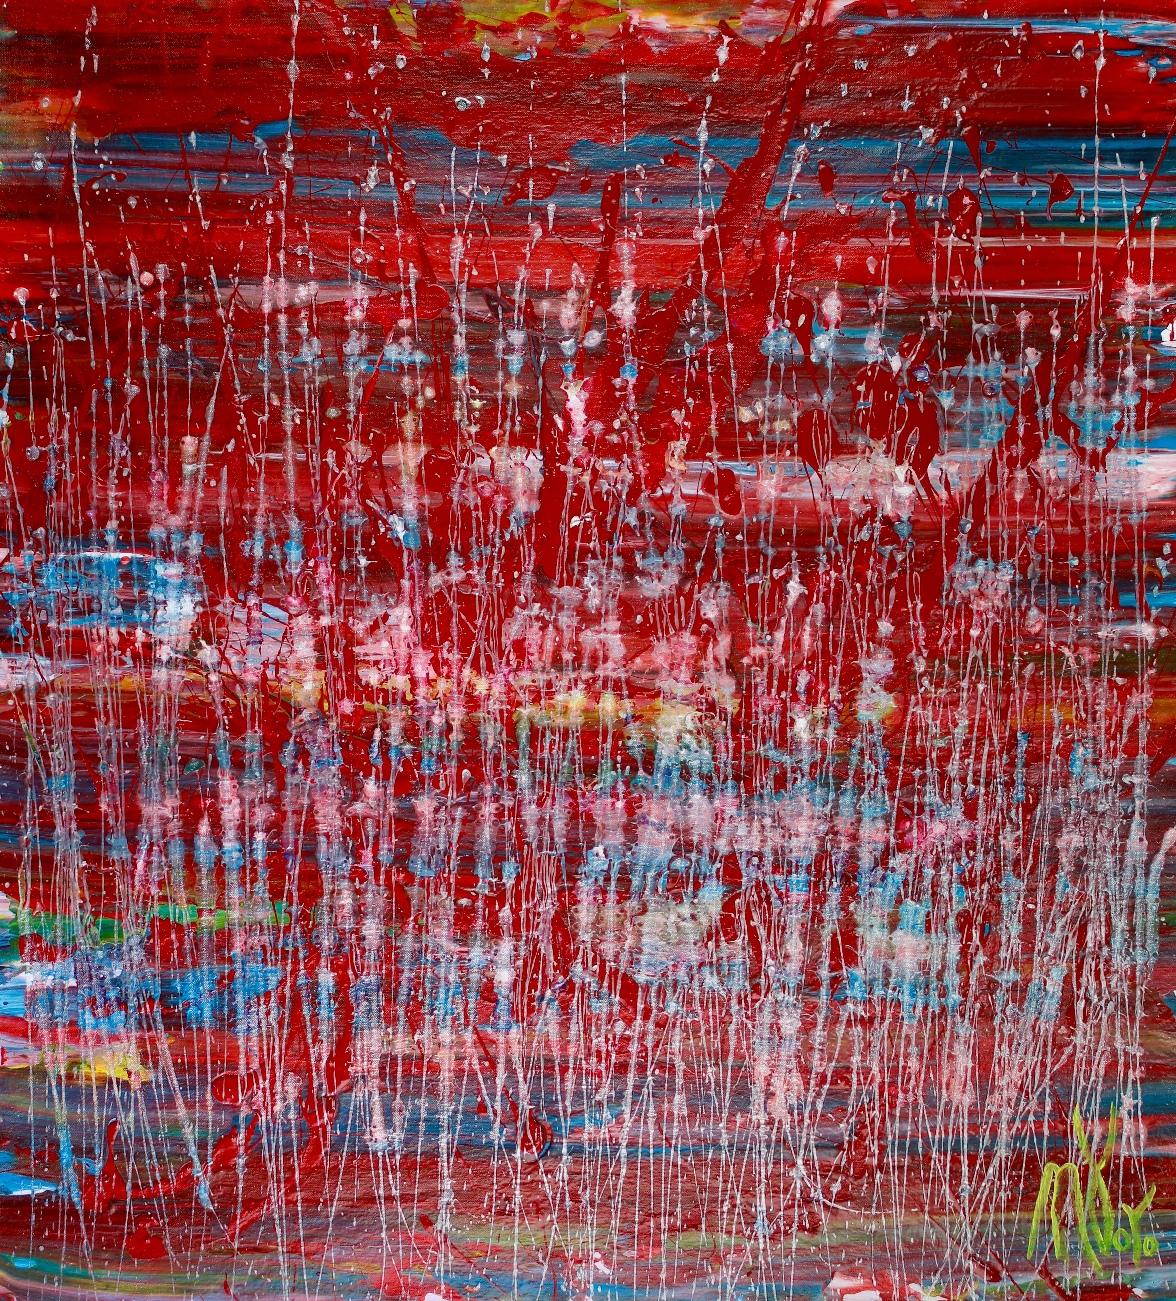 Full Image - A Closer Look (Thunder garden) by Nestor Toro 2019